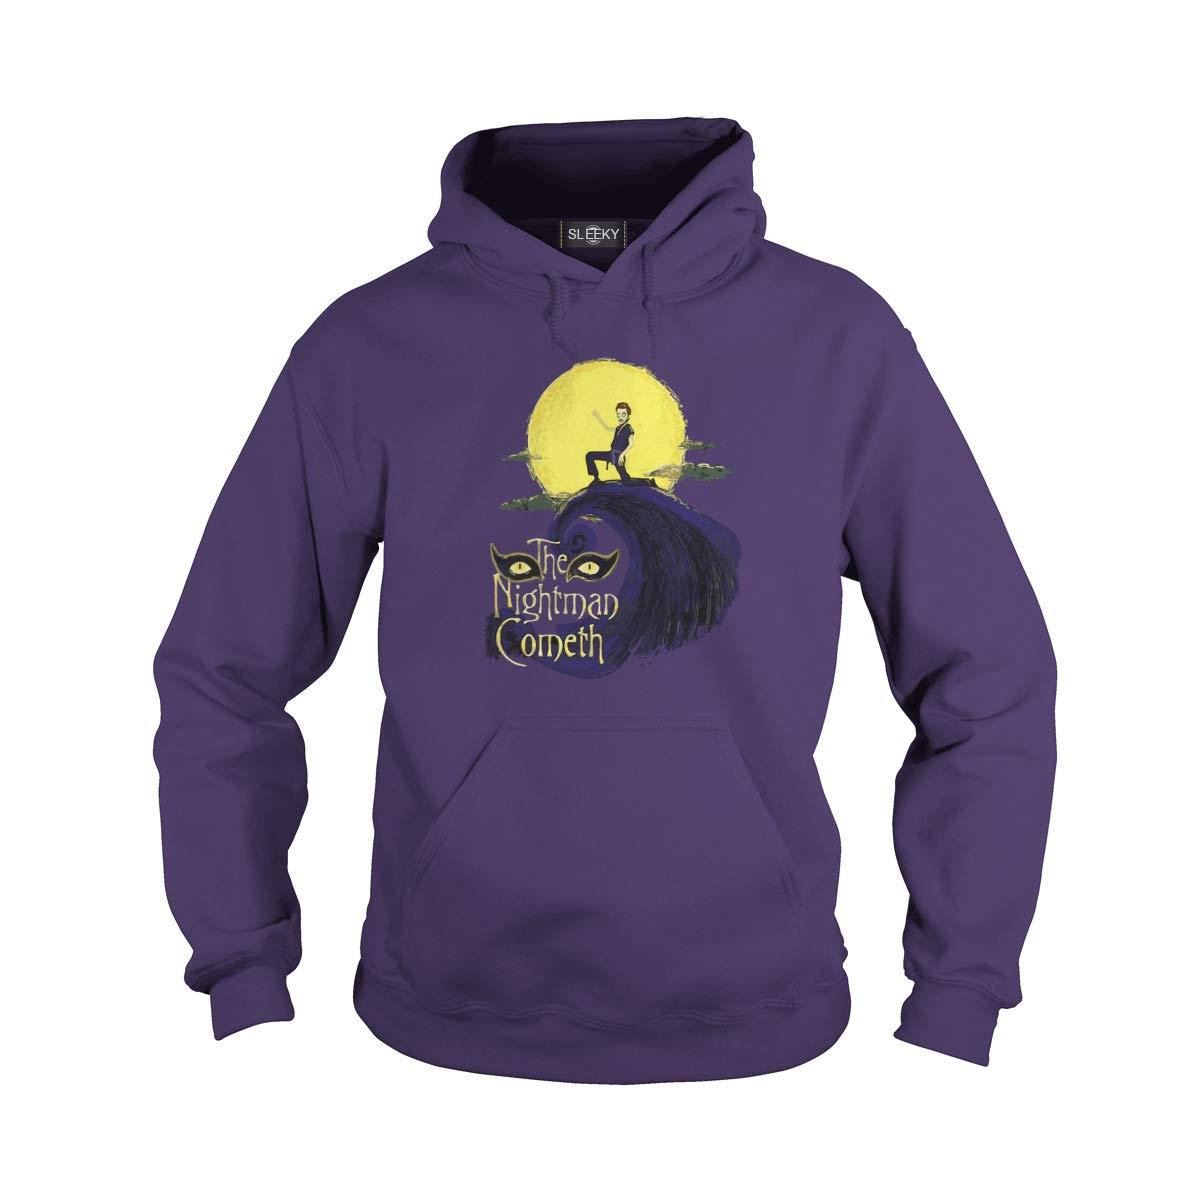 Sleeky The Nightman Cometh Its Always Sunny T-Shirt